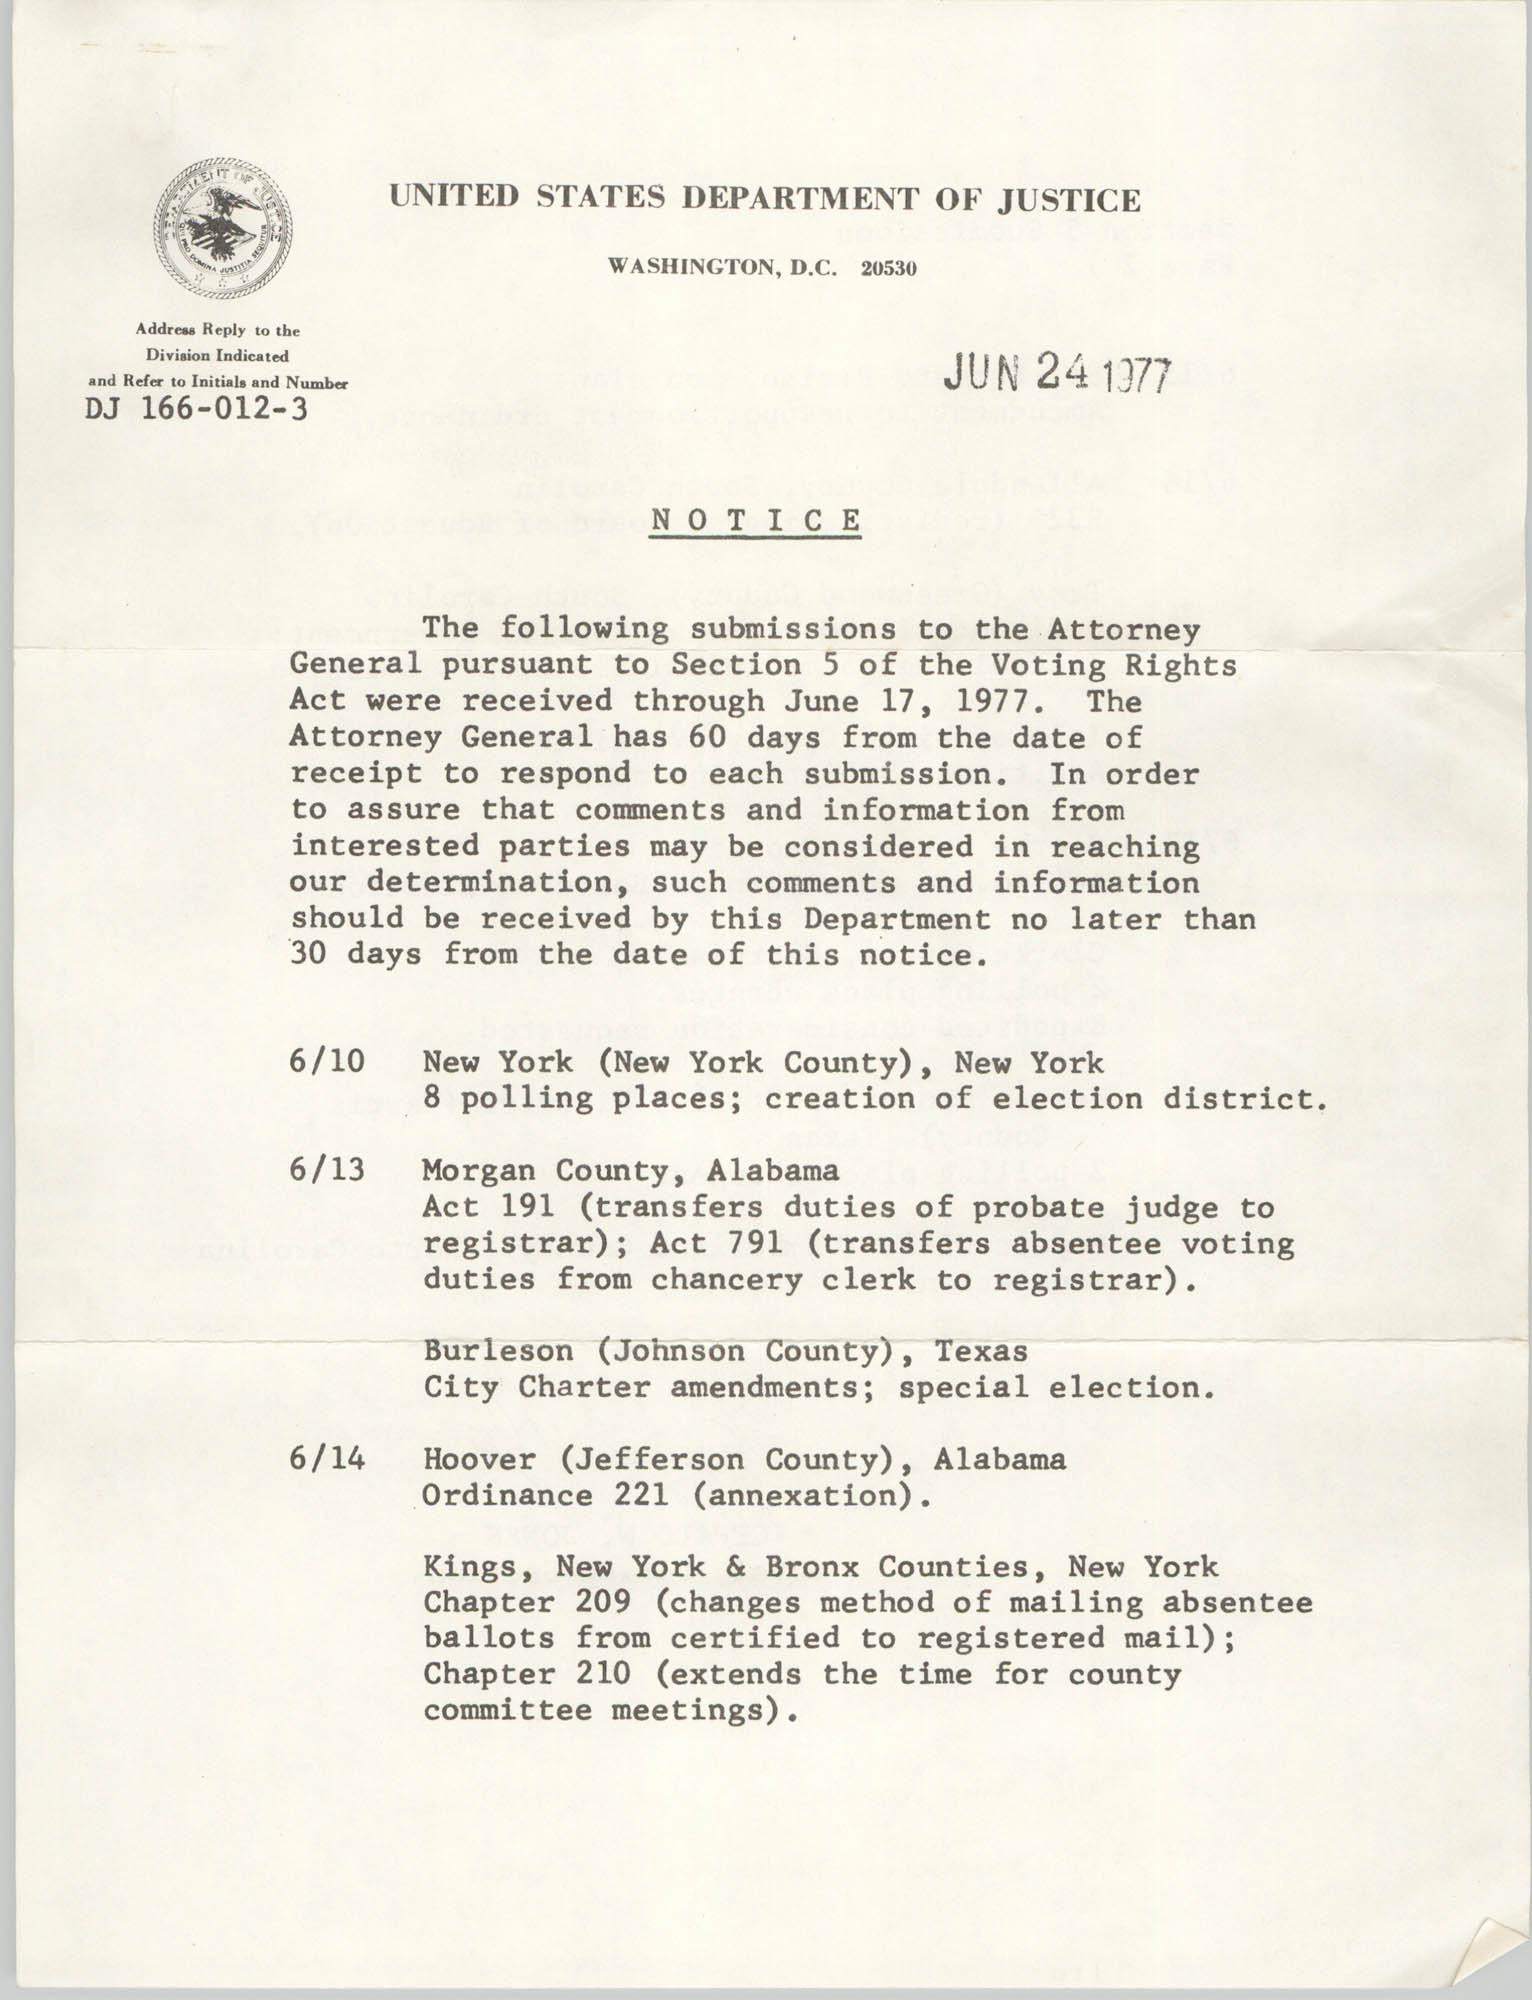 United States Department of Justice Notice, June 24, 1977